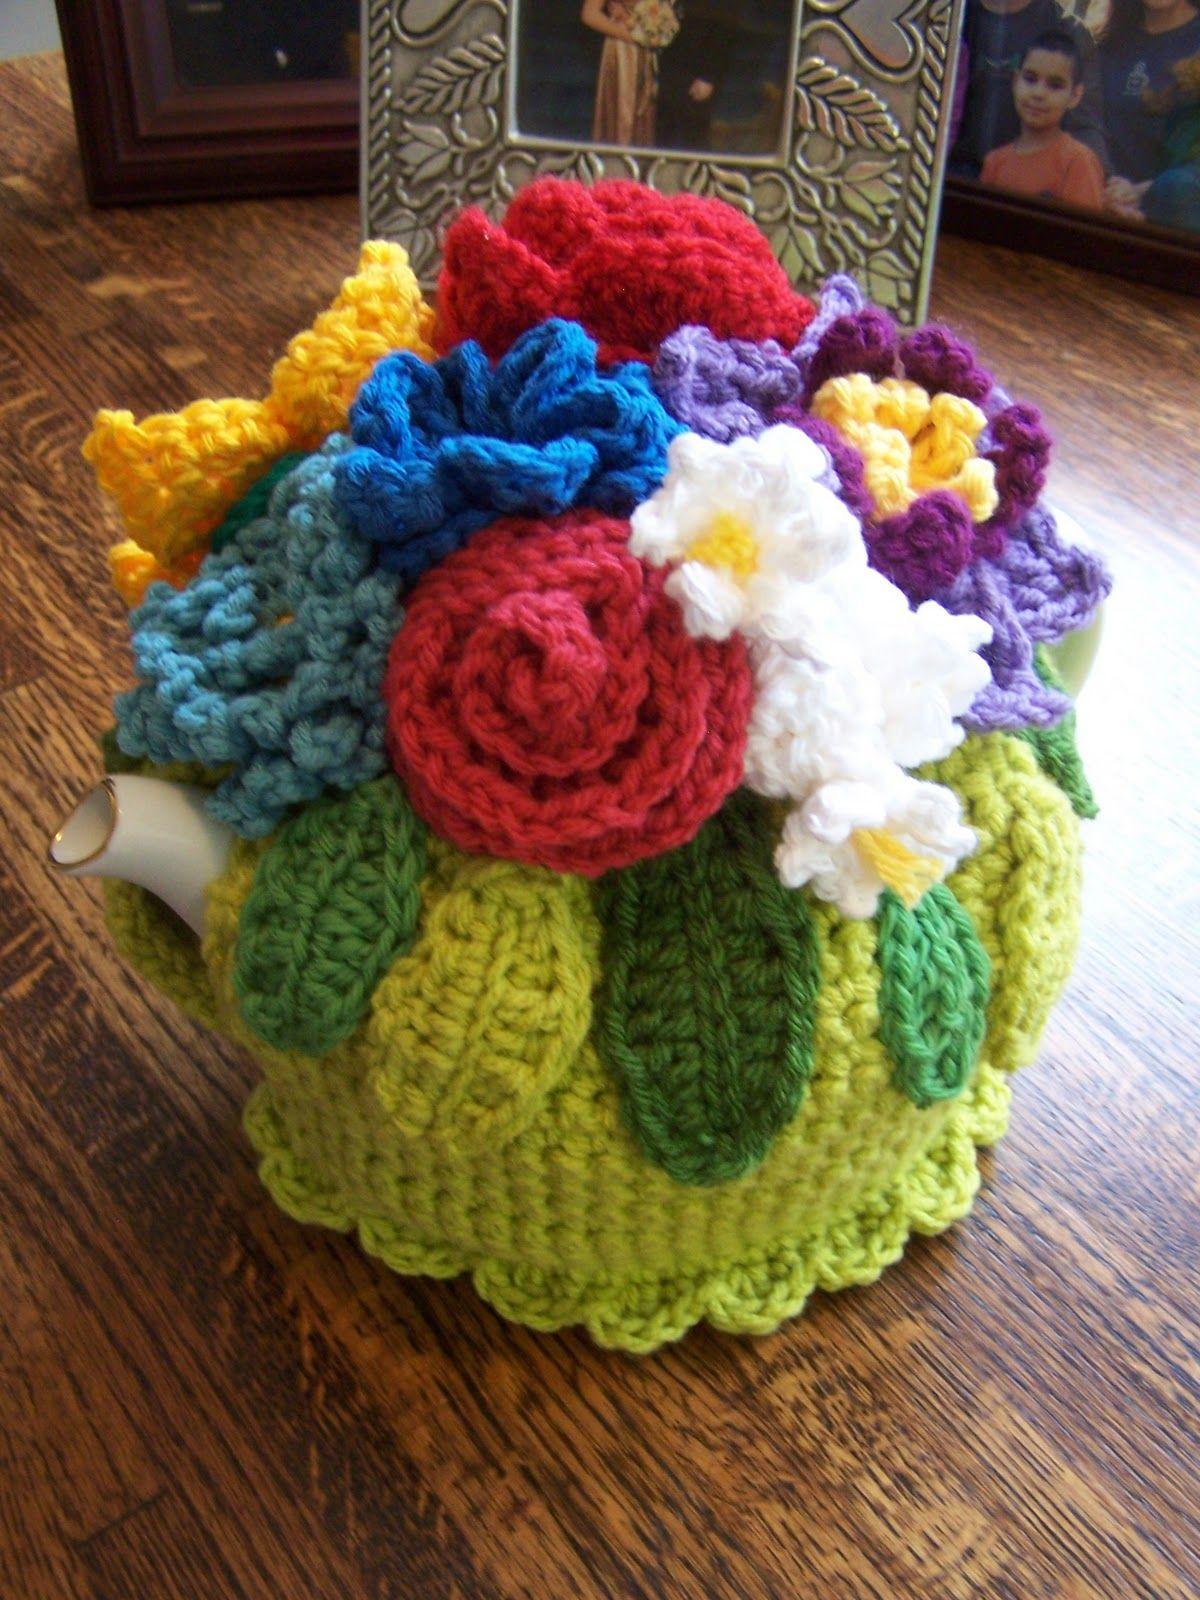 Crochet cosy cozy cozies for pots, cups and mugs. Tea Cosy Tutorial ...